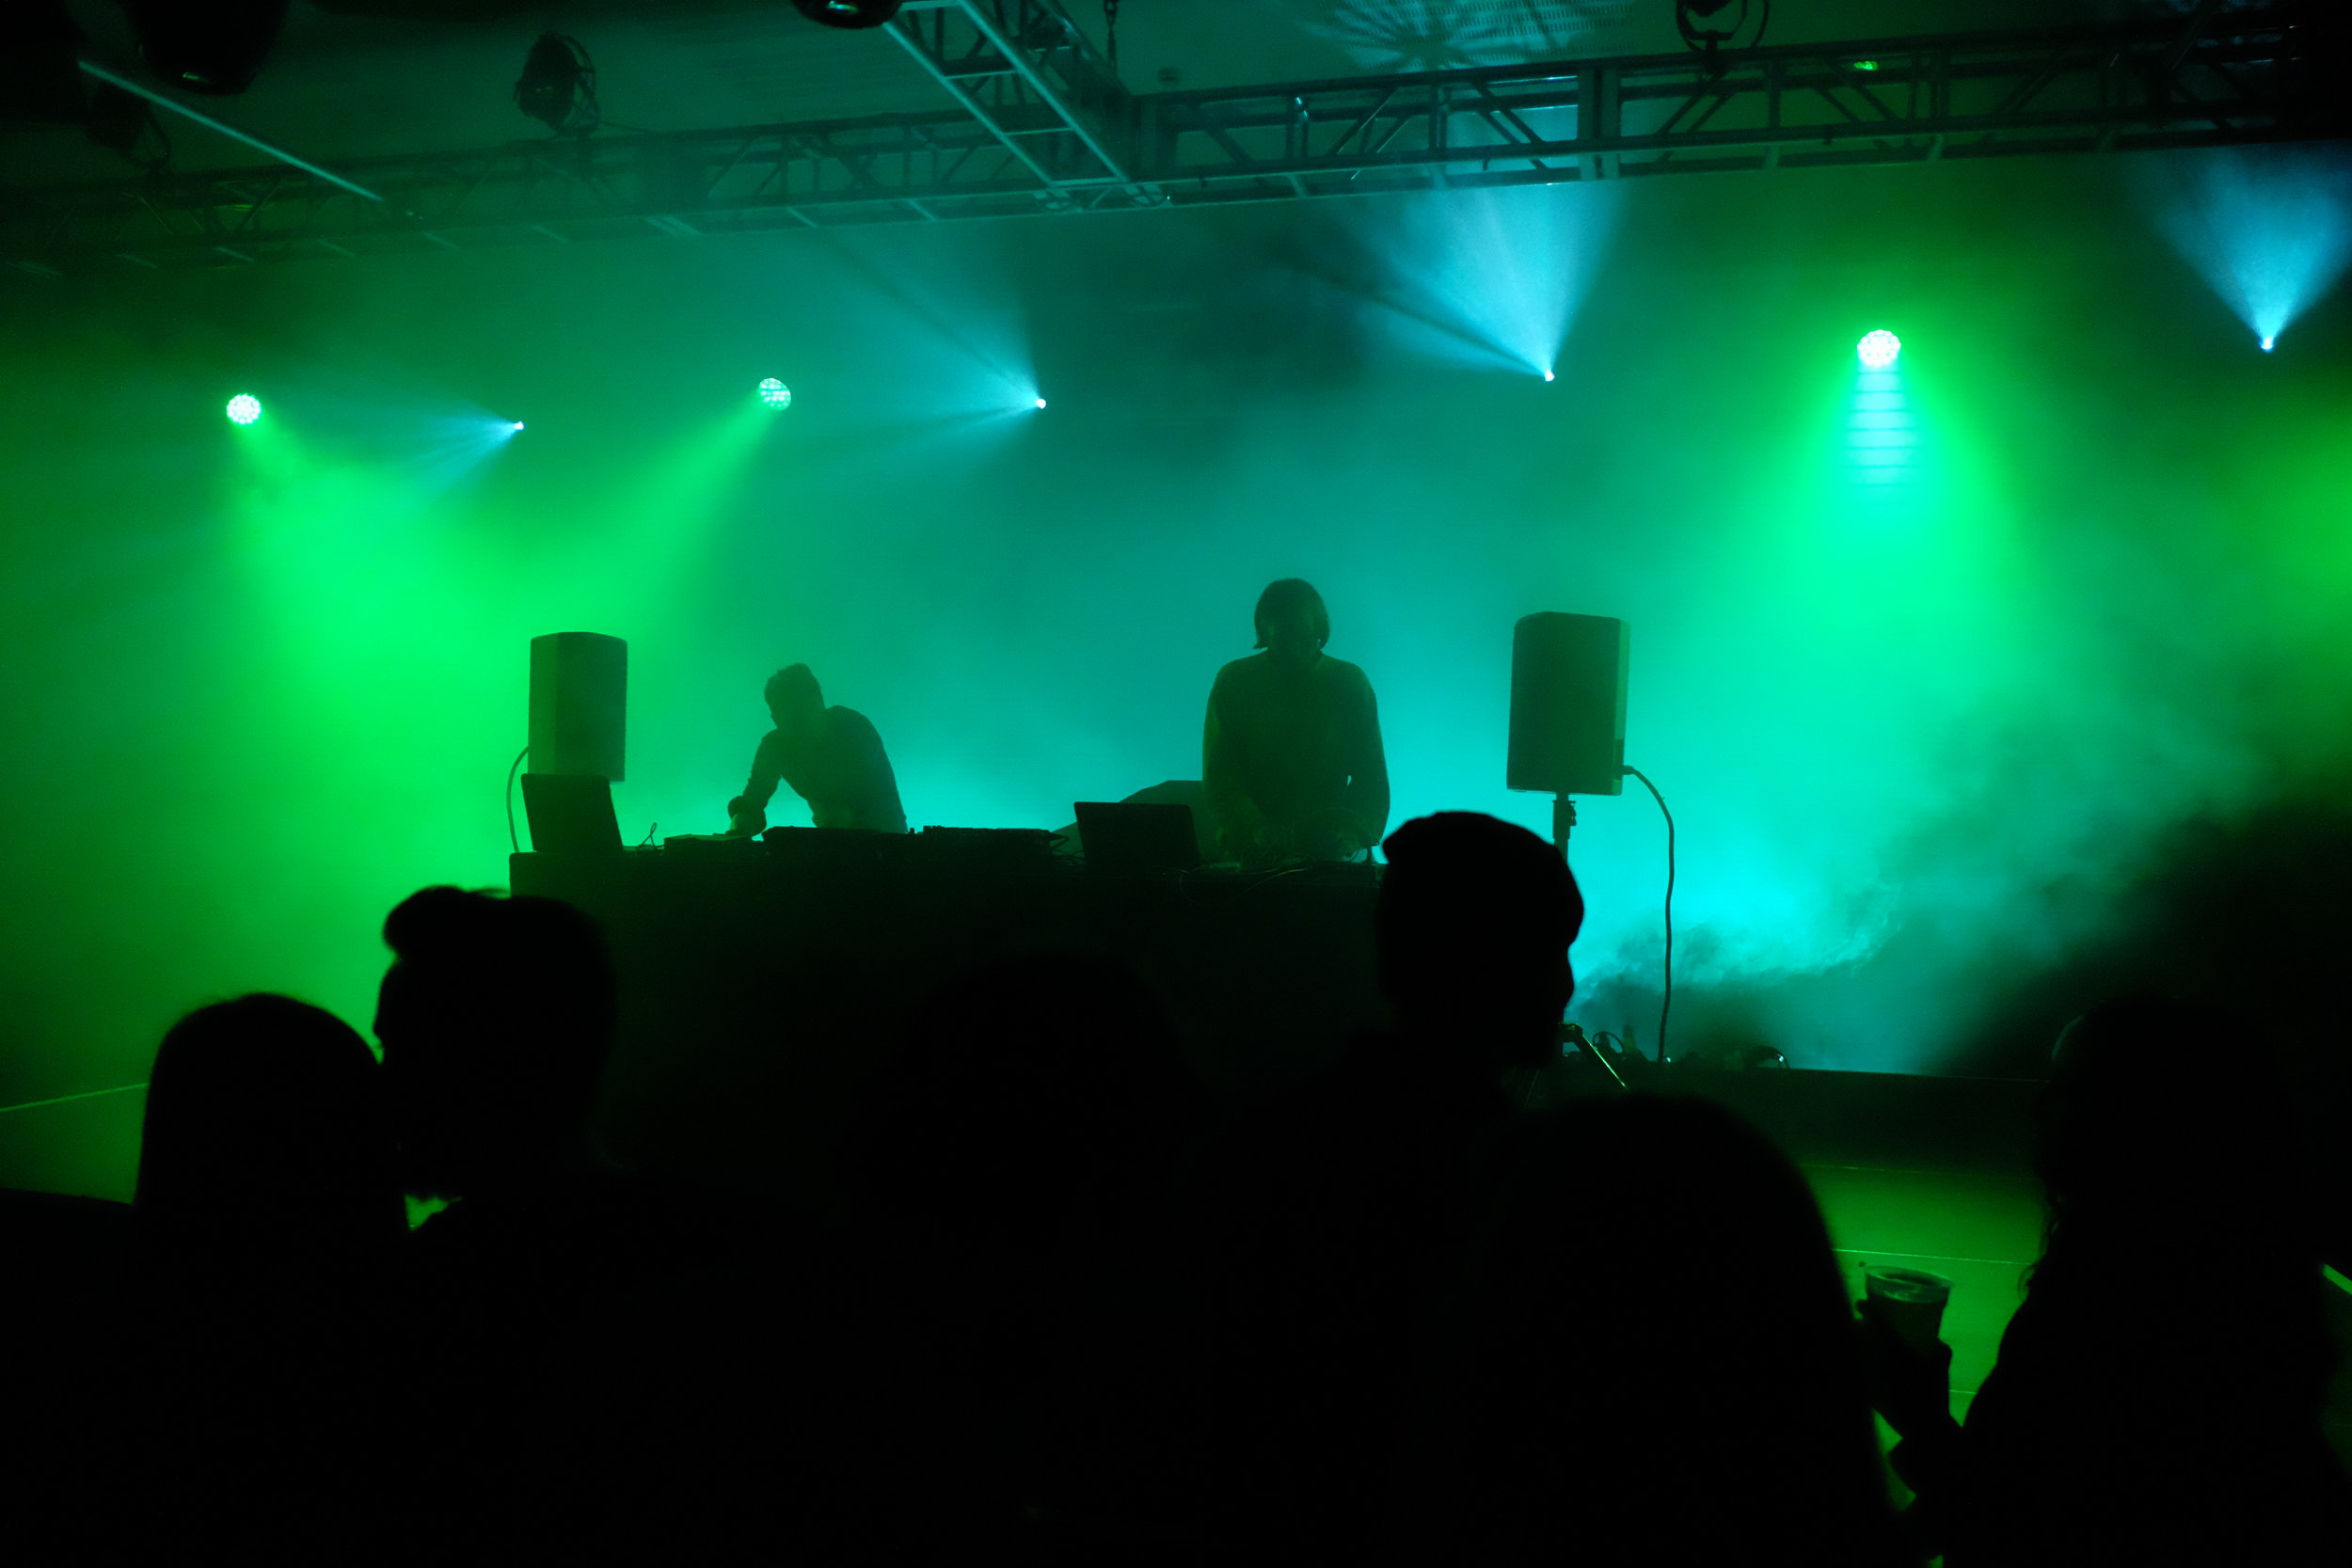 GIDGE at LATE NIGHT NORDIC SOUNDS, NMD 30 September 2017, Photo: Paola Padoan